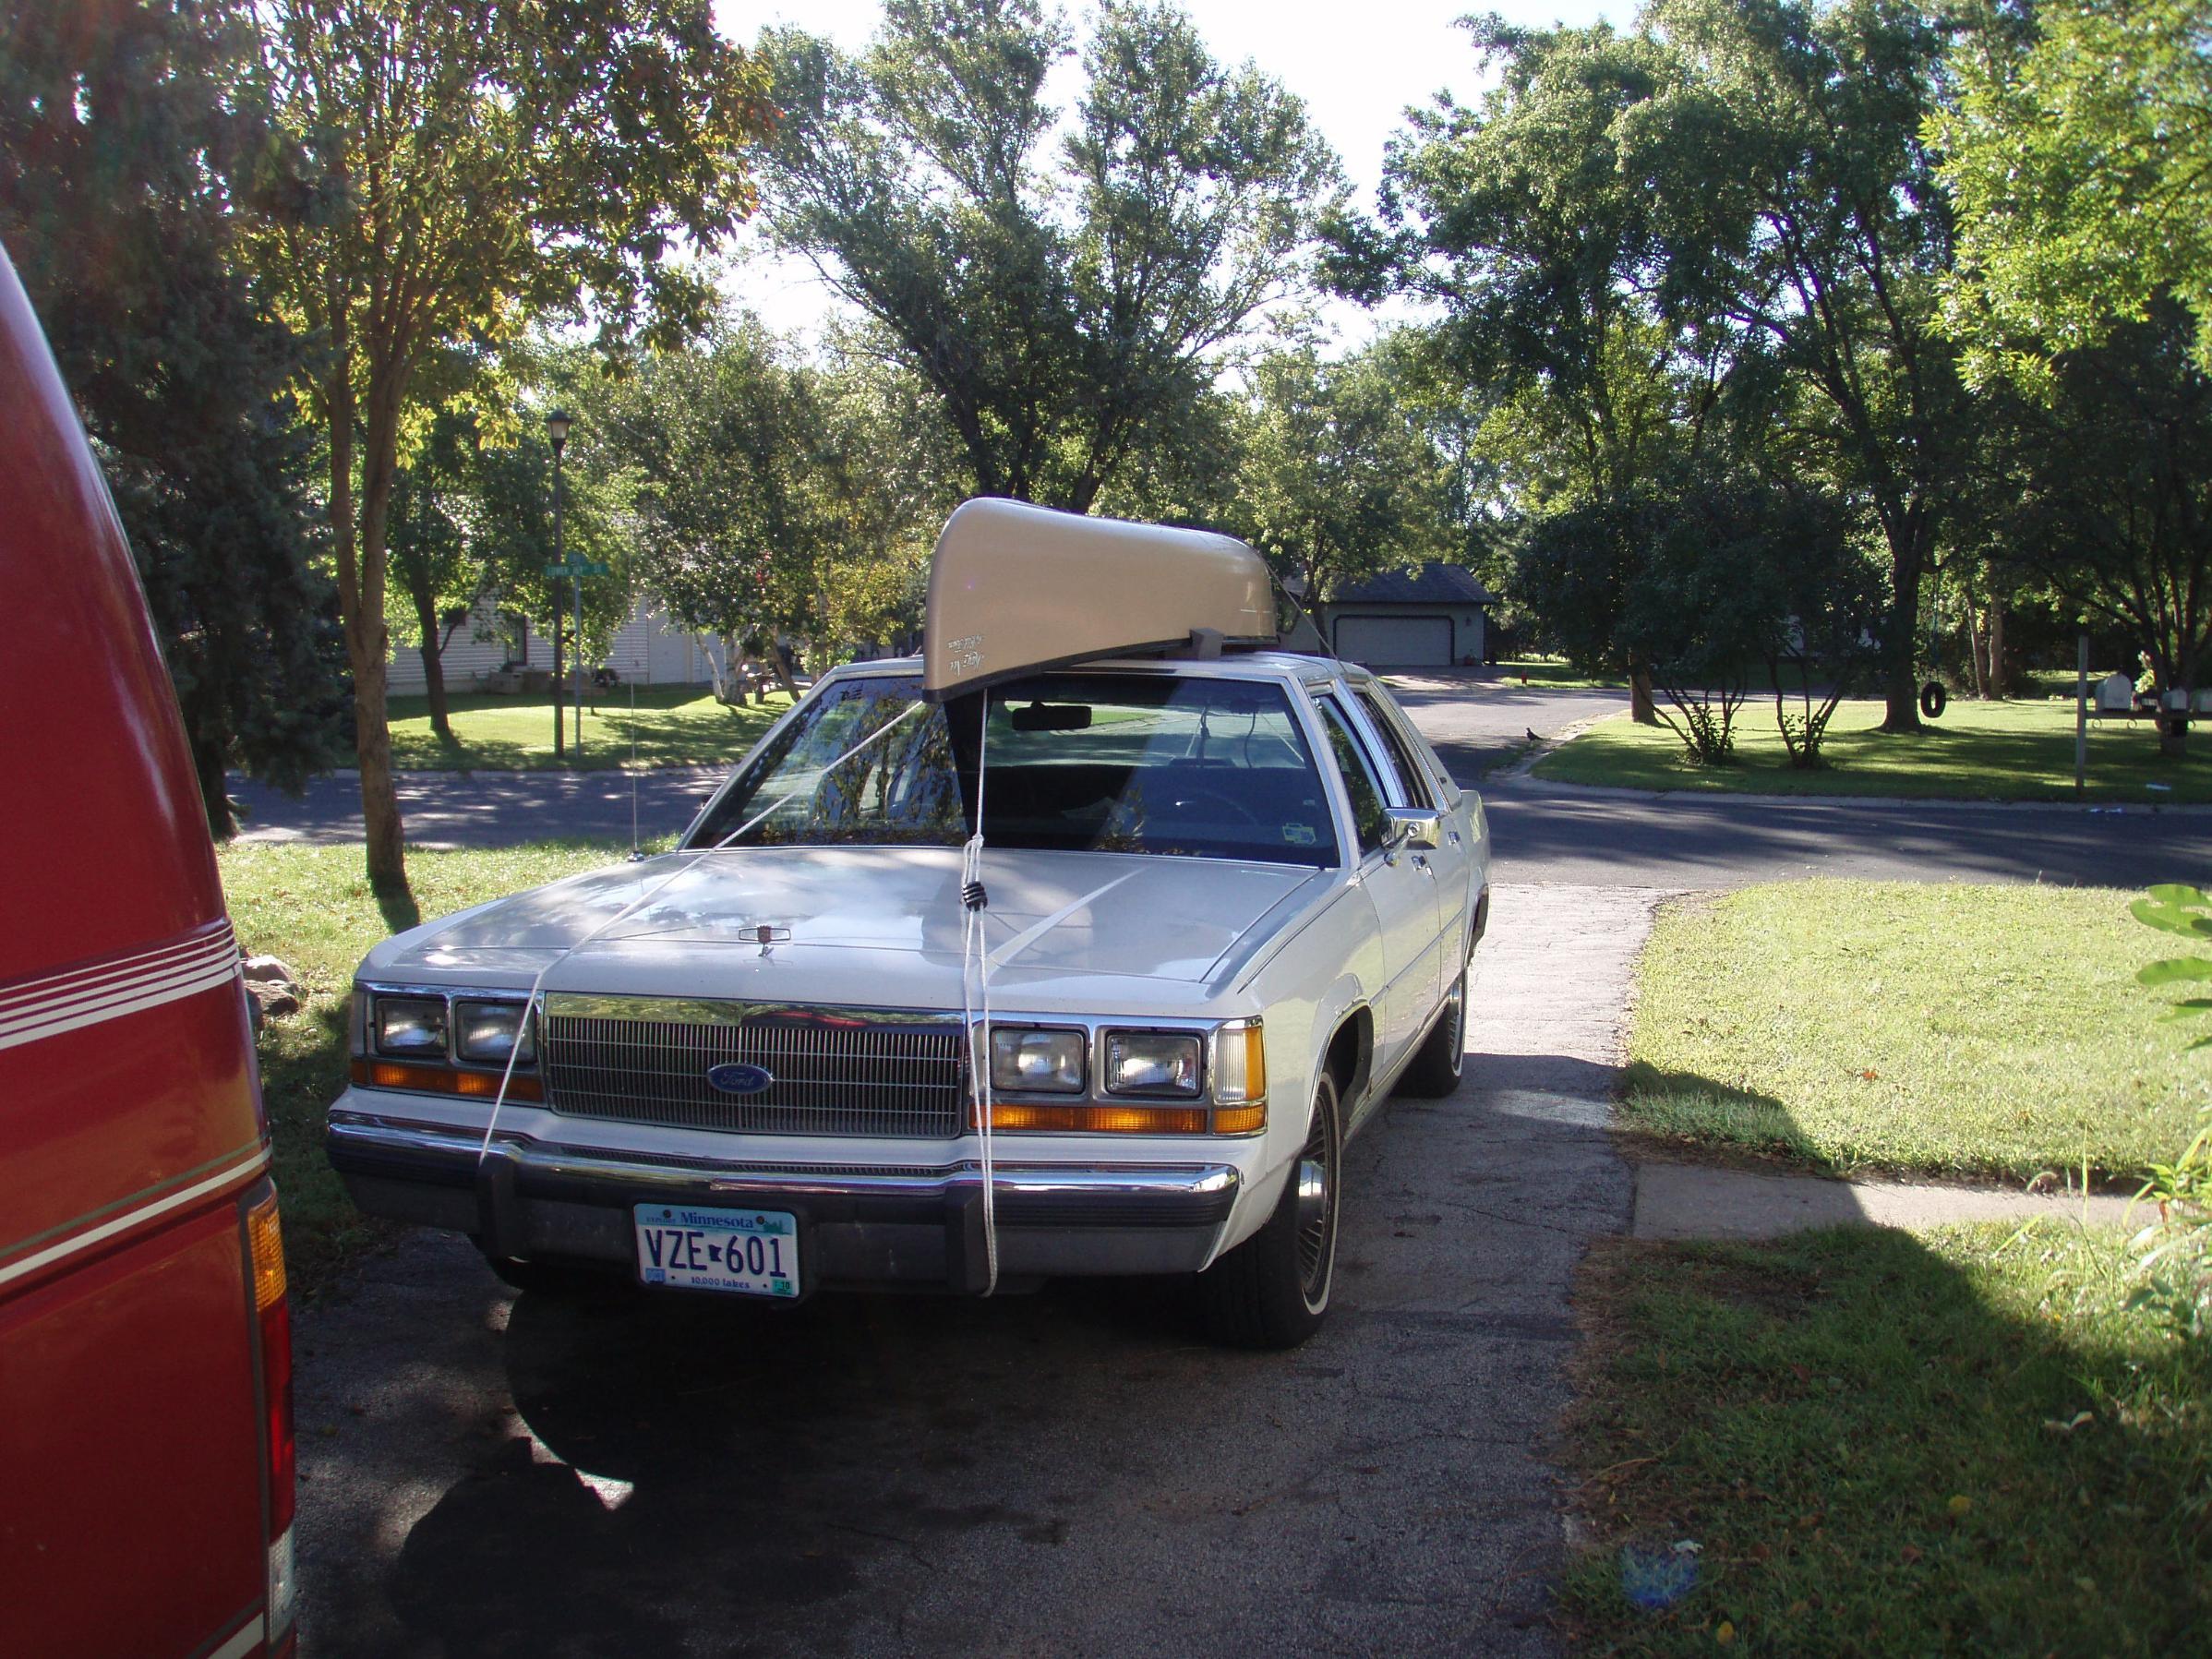 01 Loaded car